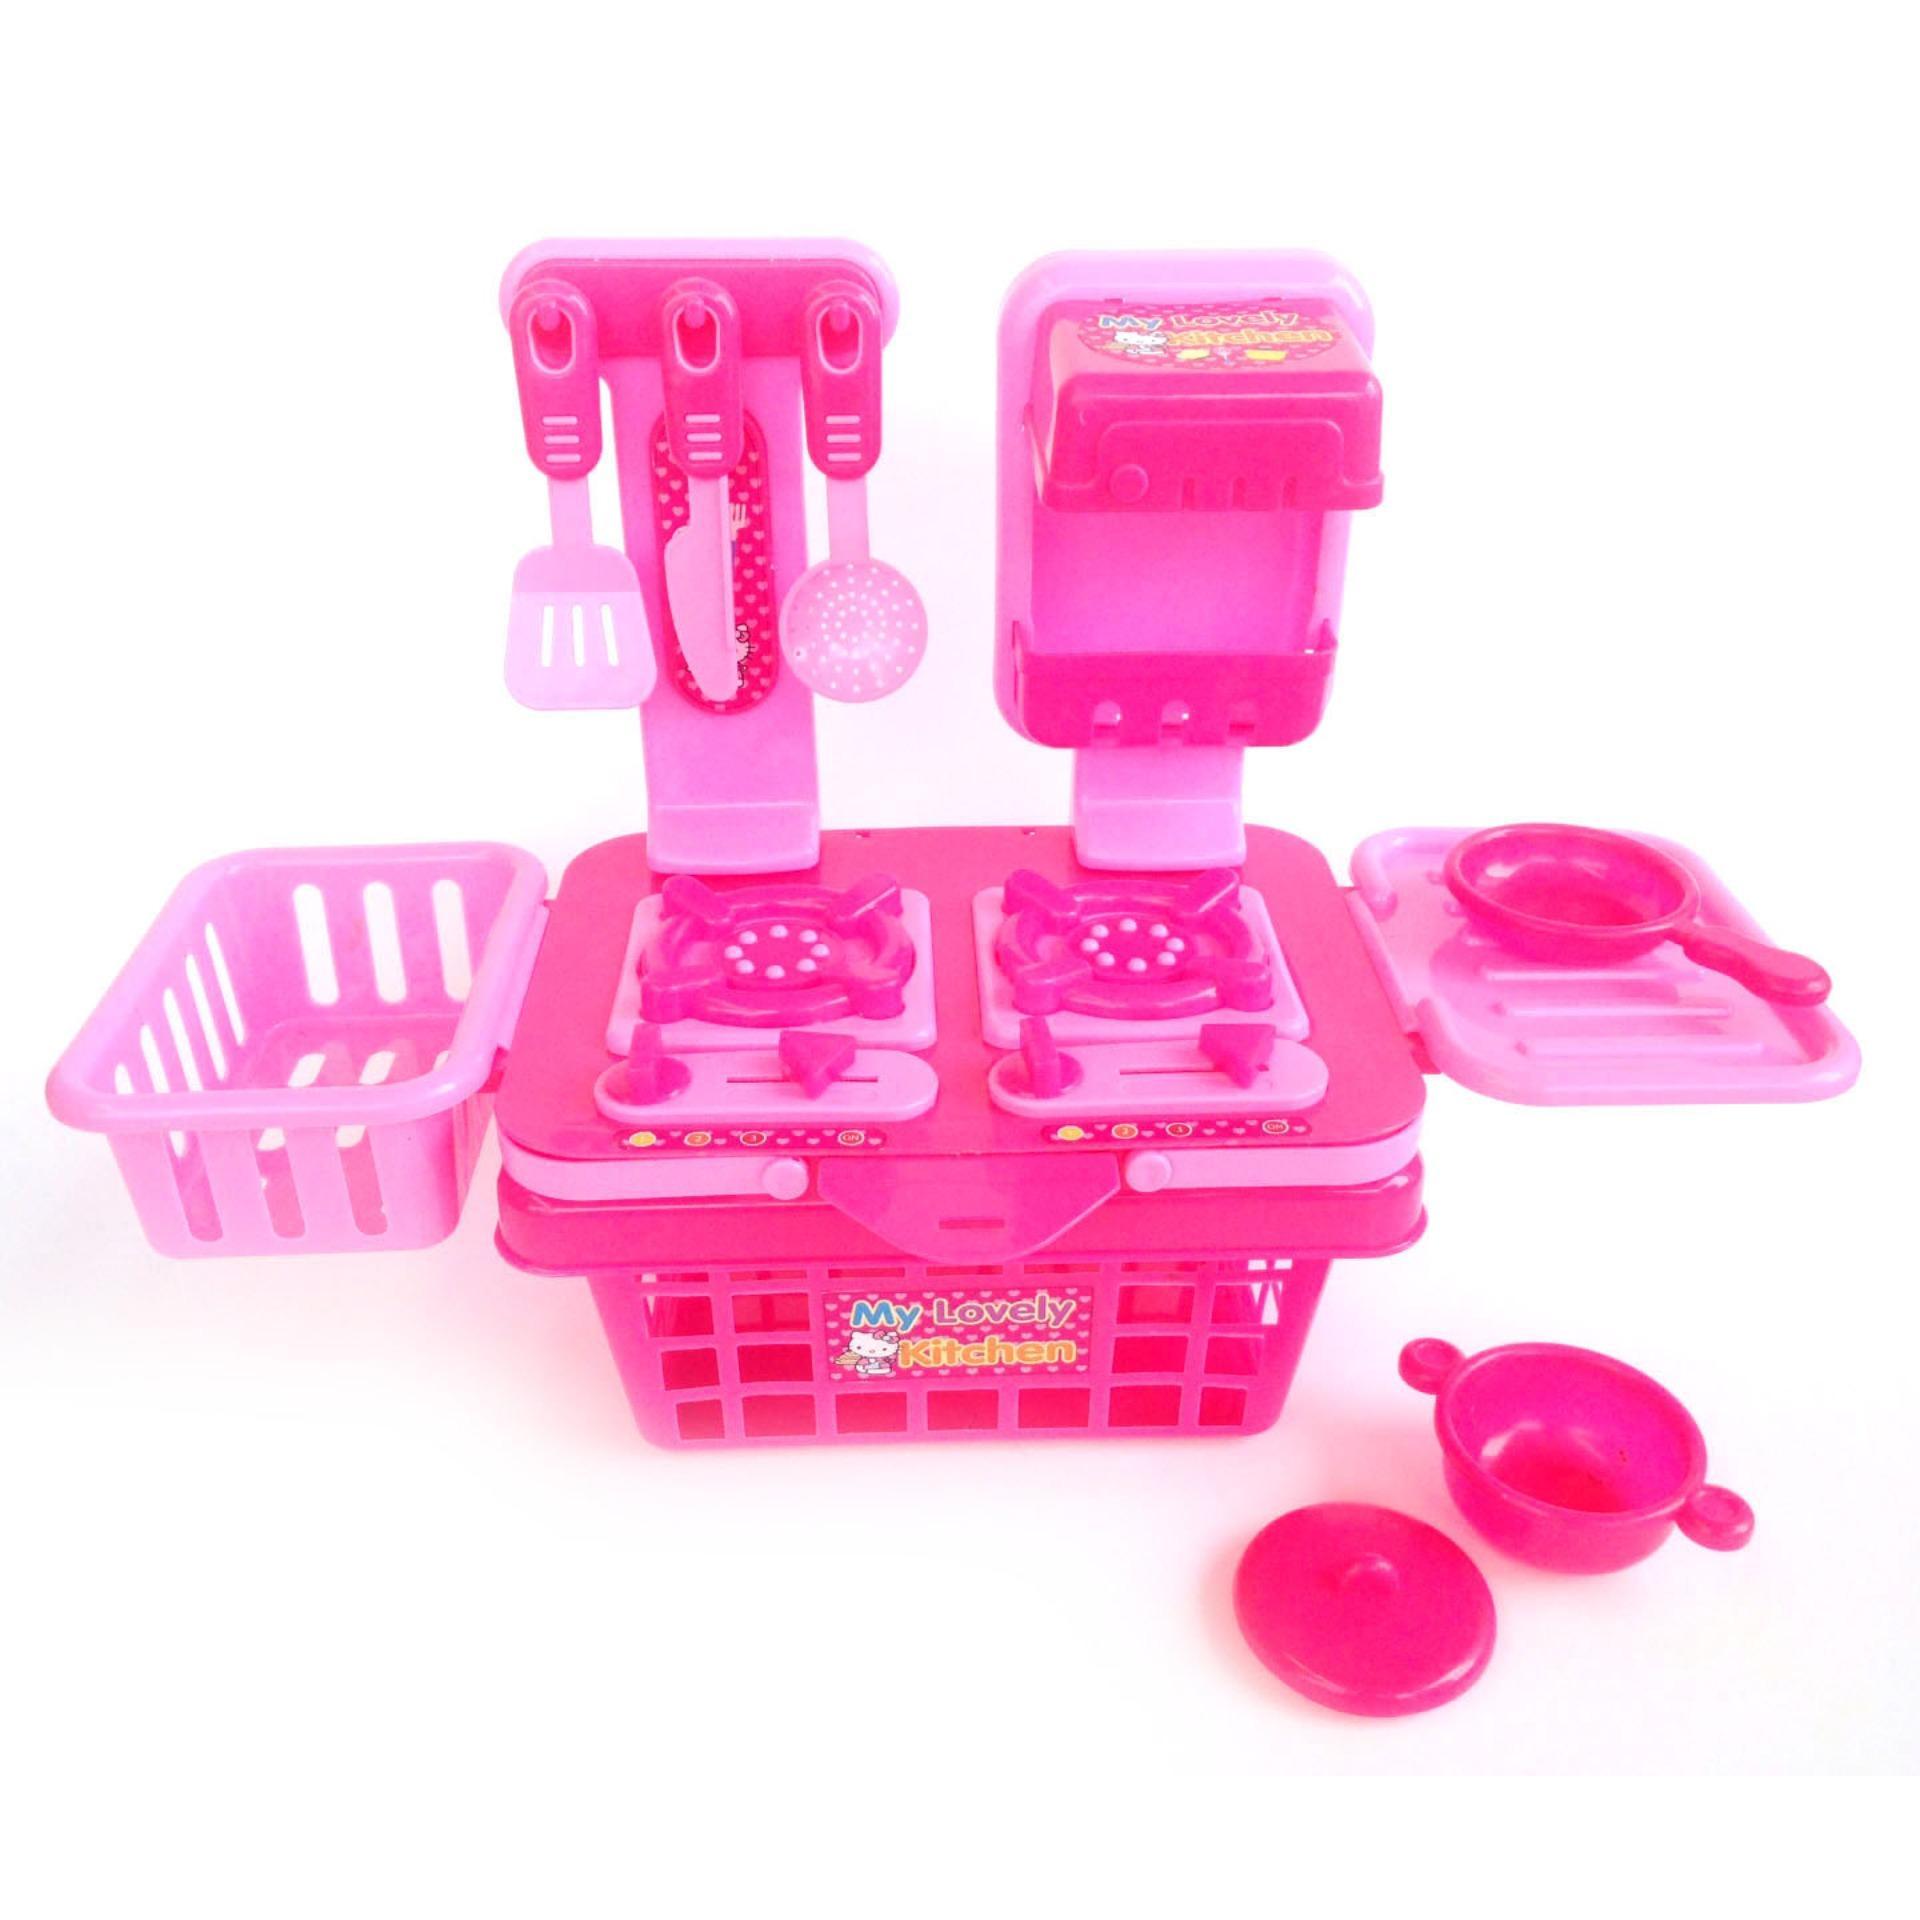 Mainan Anak Perempuan Masak Masakan Mainan Anak Edukasi Mainan Masak Masakan My Lovely Kitchen Mainan Murah Lazada Indonesia